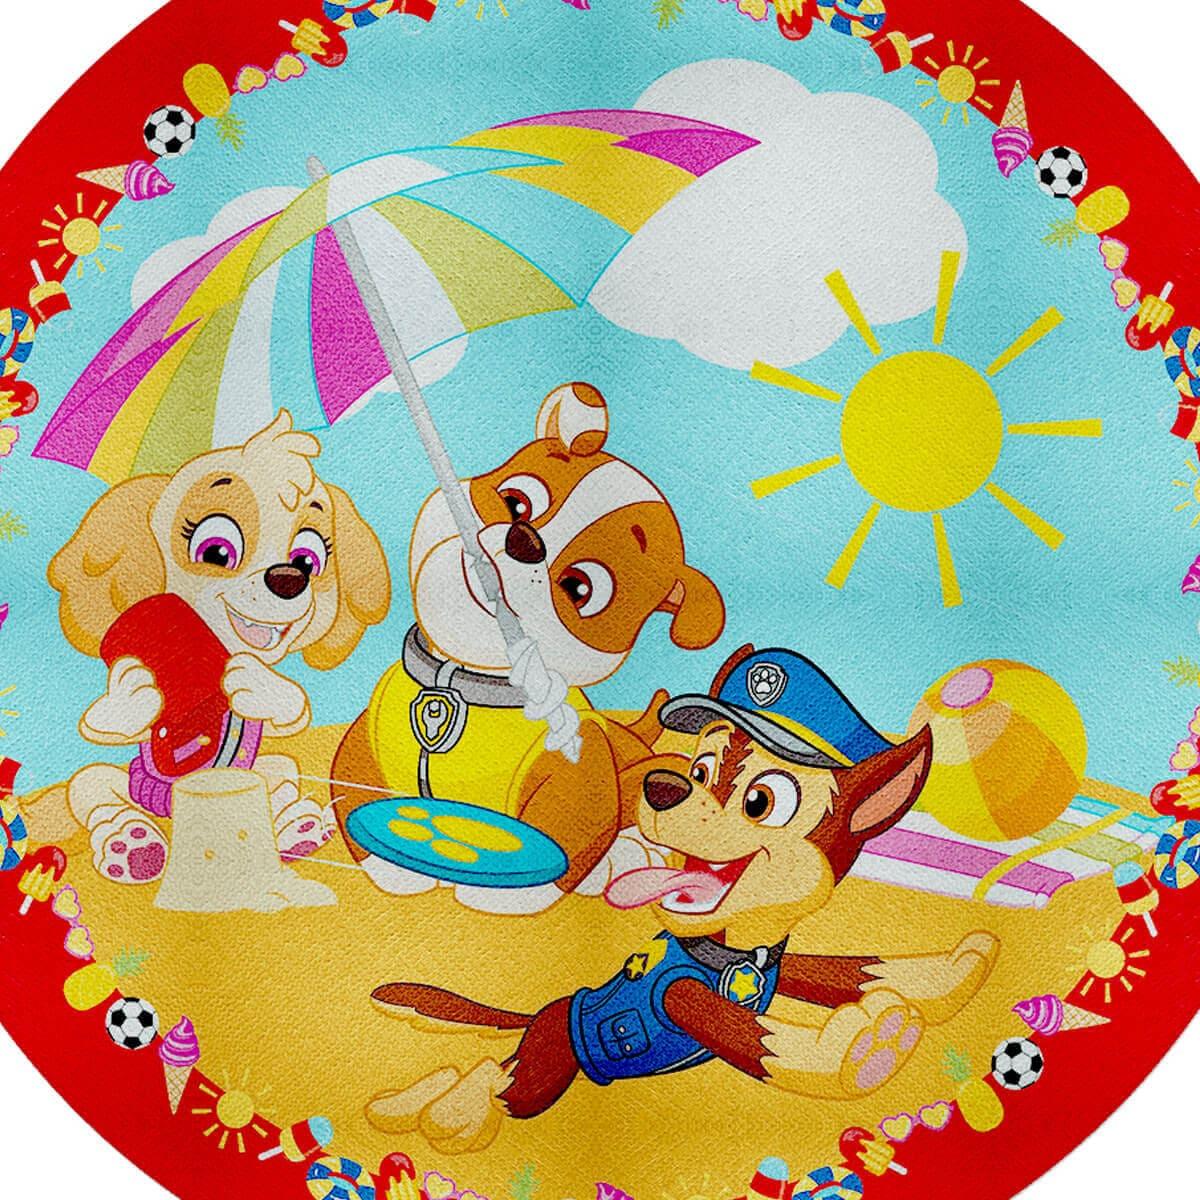 Toalha de Praia Infantil Aveludada Redonda Patrulha Canina Beach